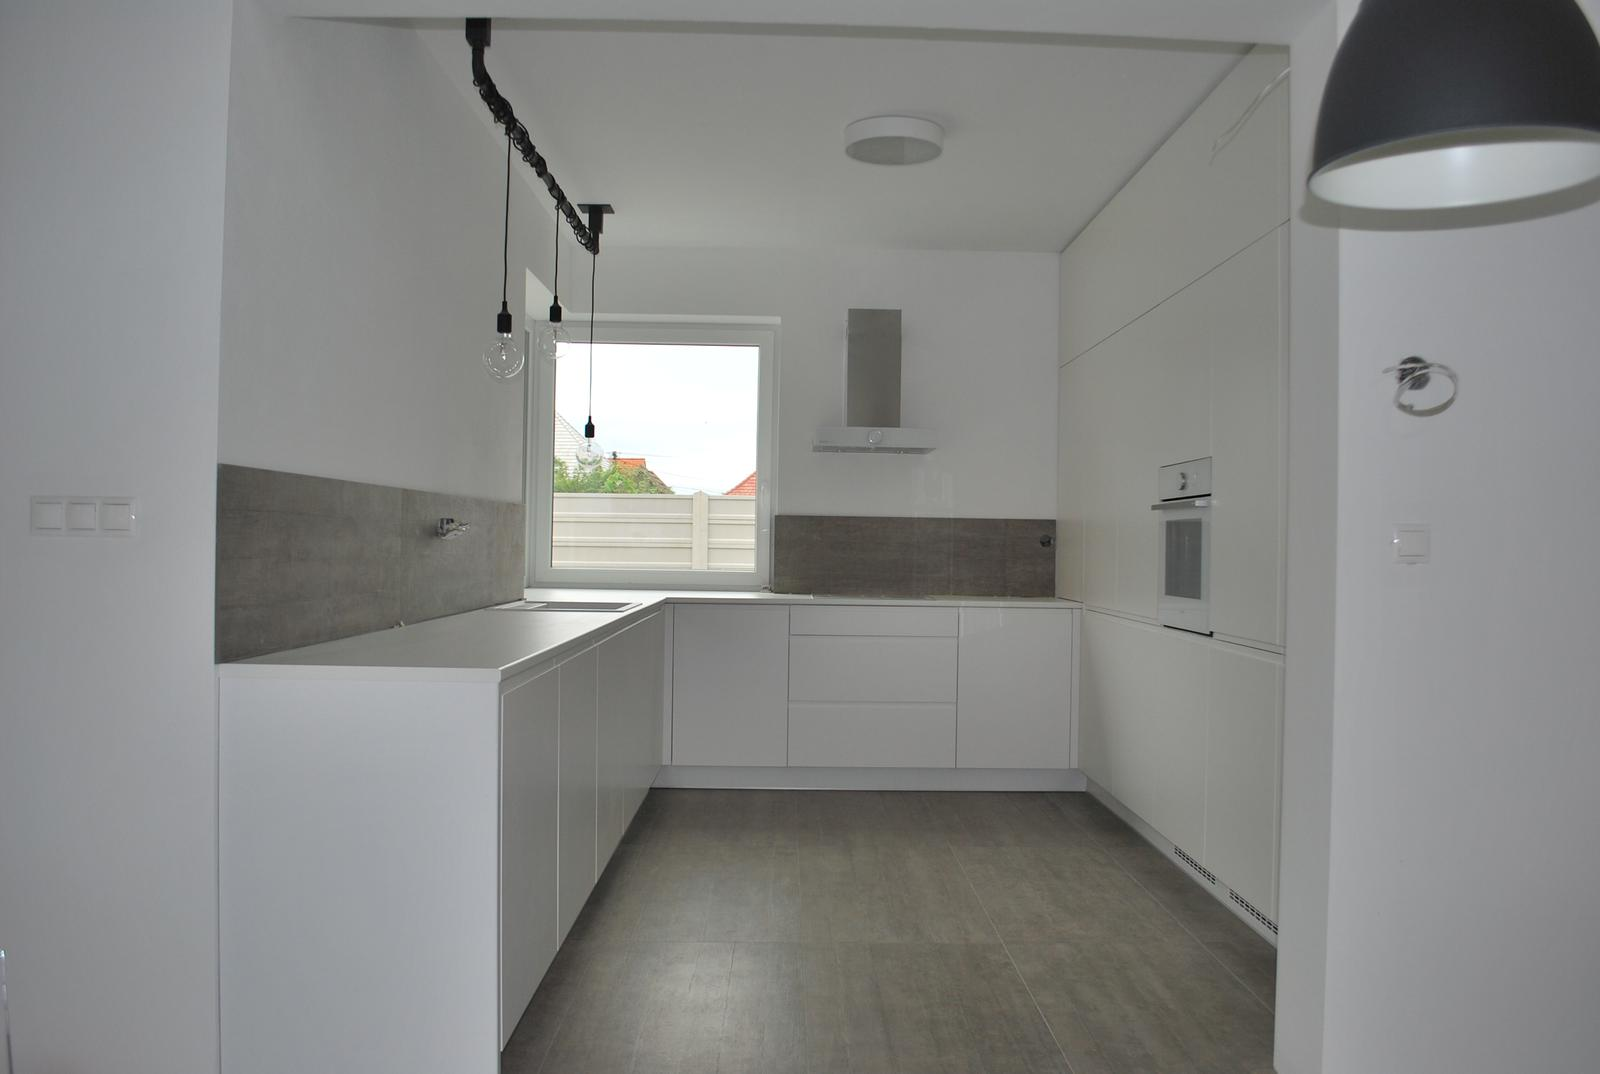 Kuchyne - Kuchyňa biela matná striekaná